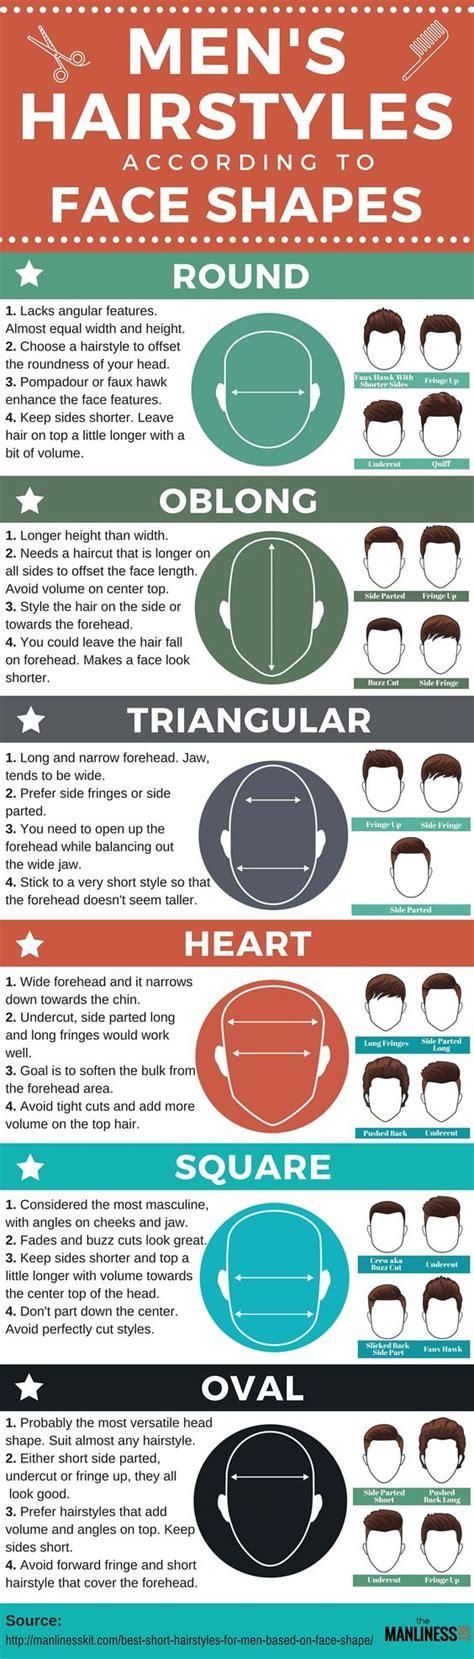 hairstyles for men based on face shape short hairstyles for men face shape hair and face shapes